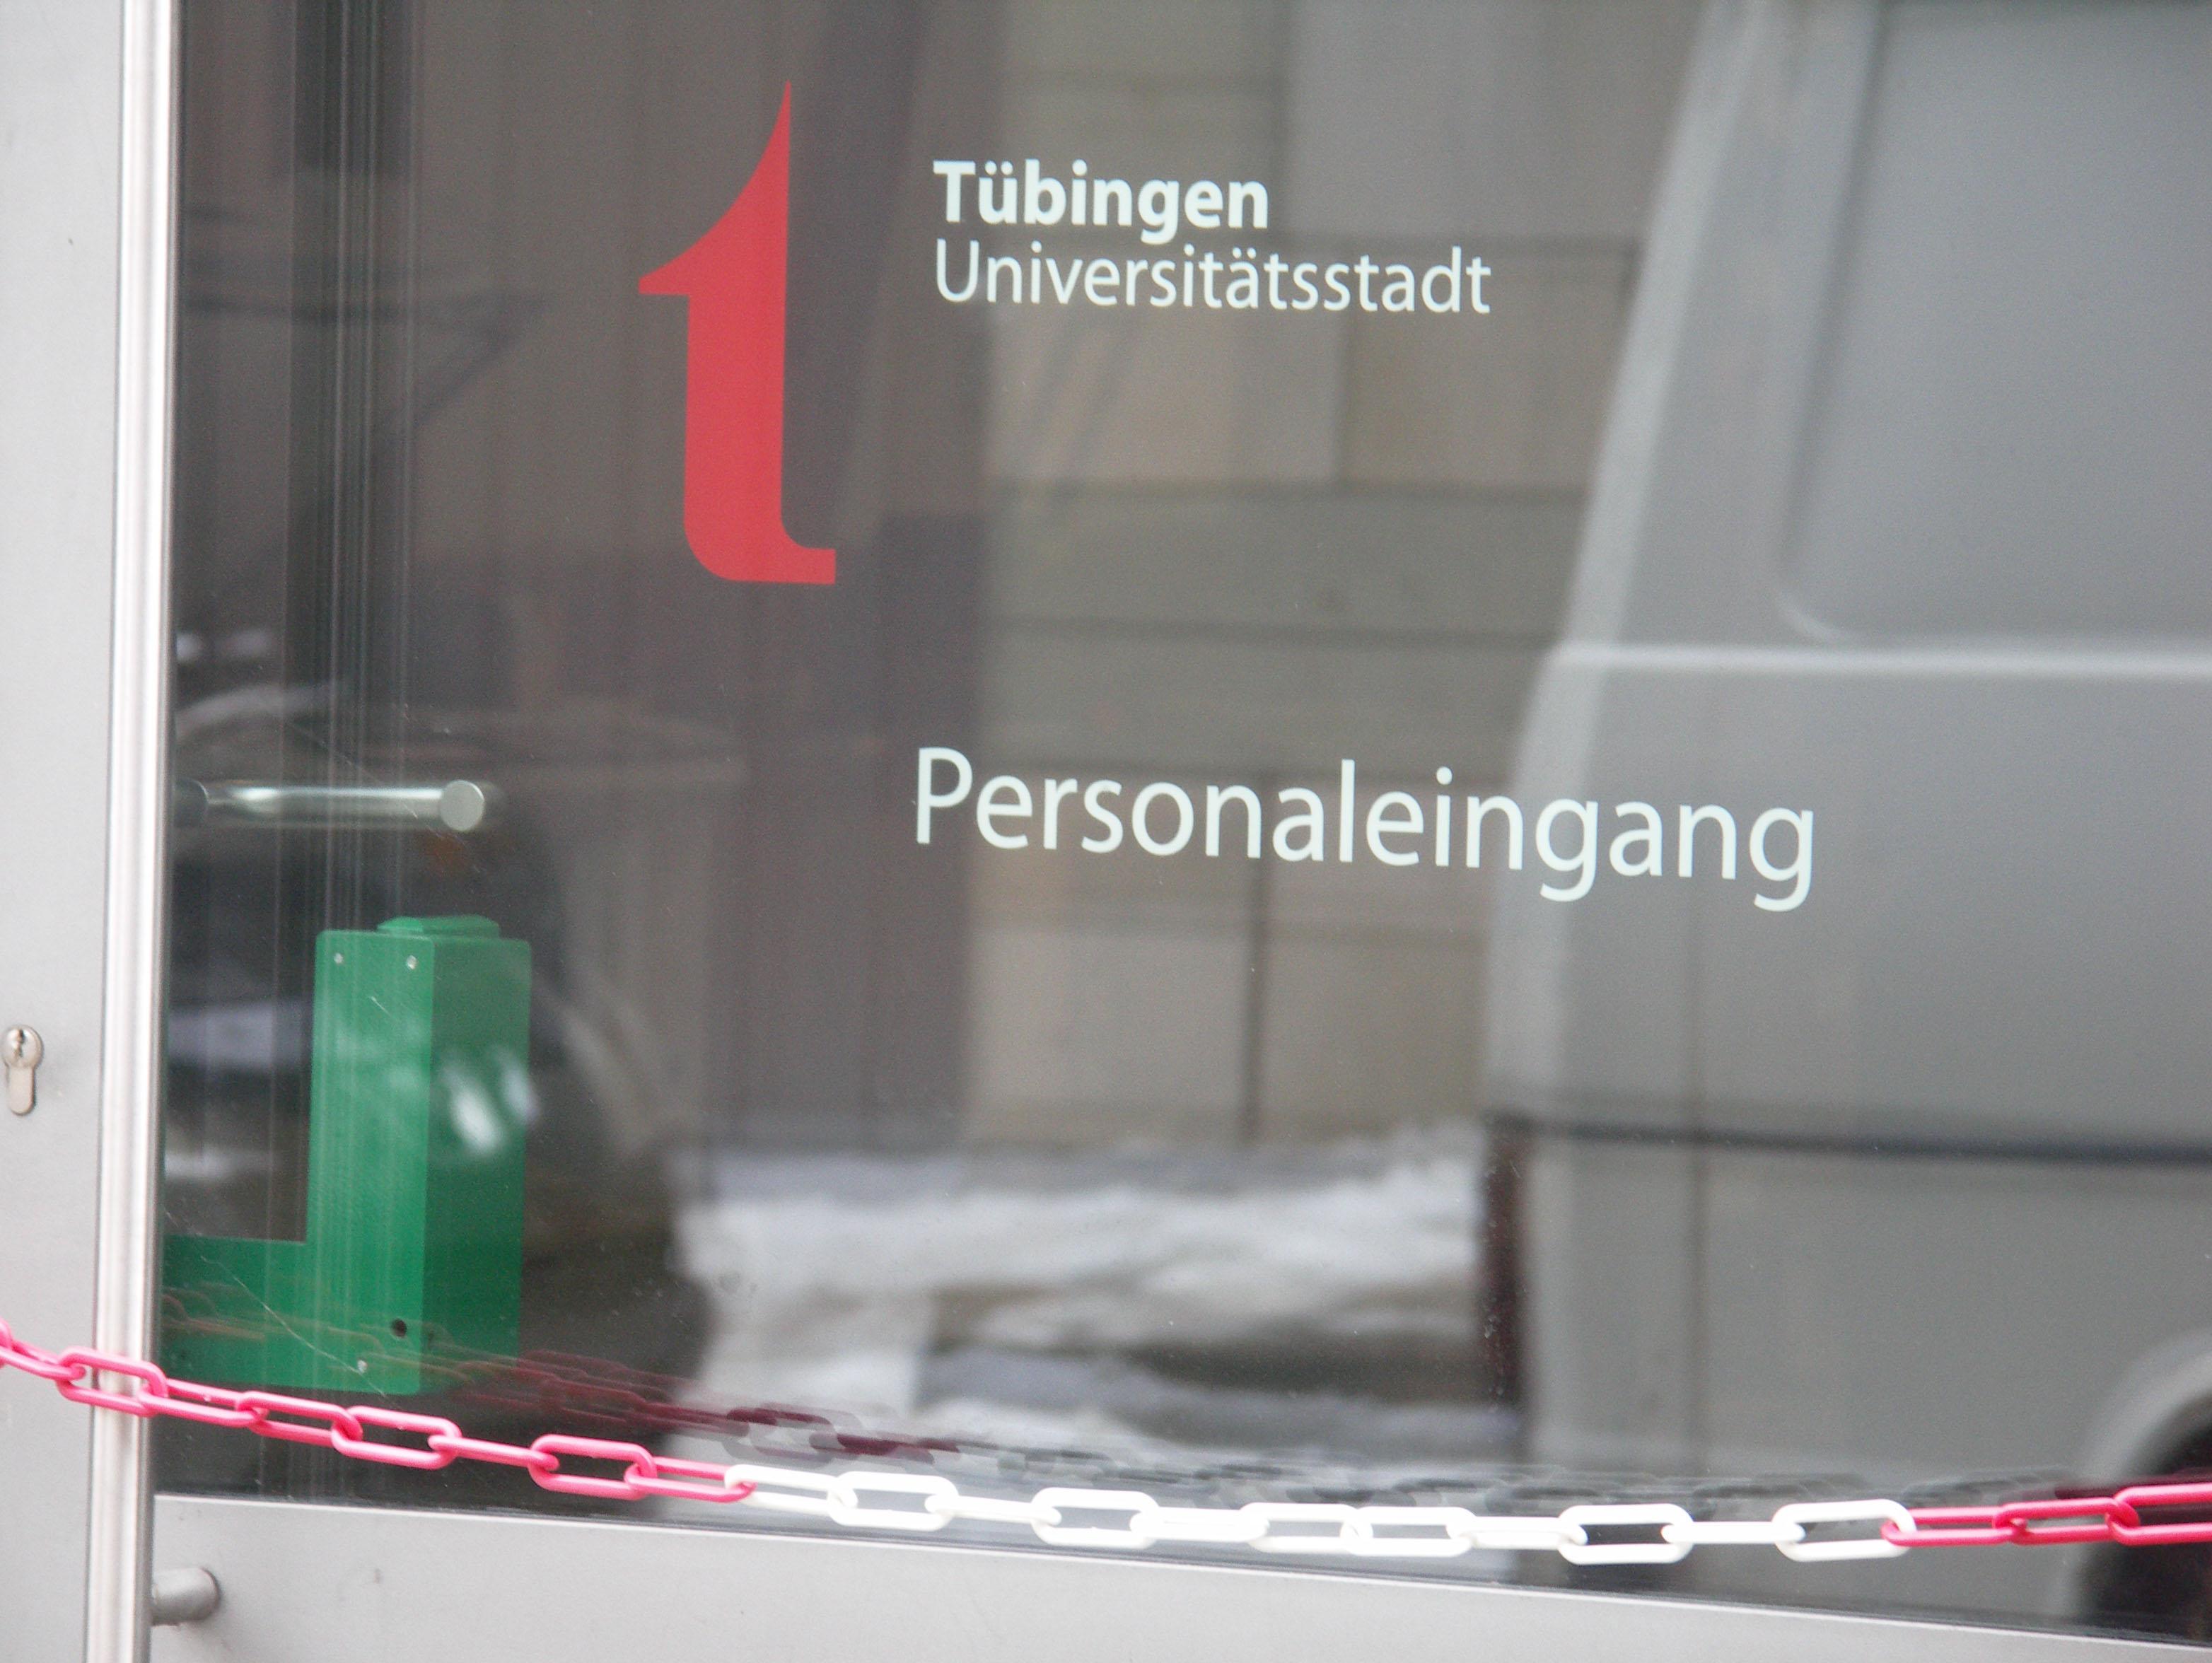 Personaleingang der Stadt Tübingen. Foto: Landwehr.